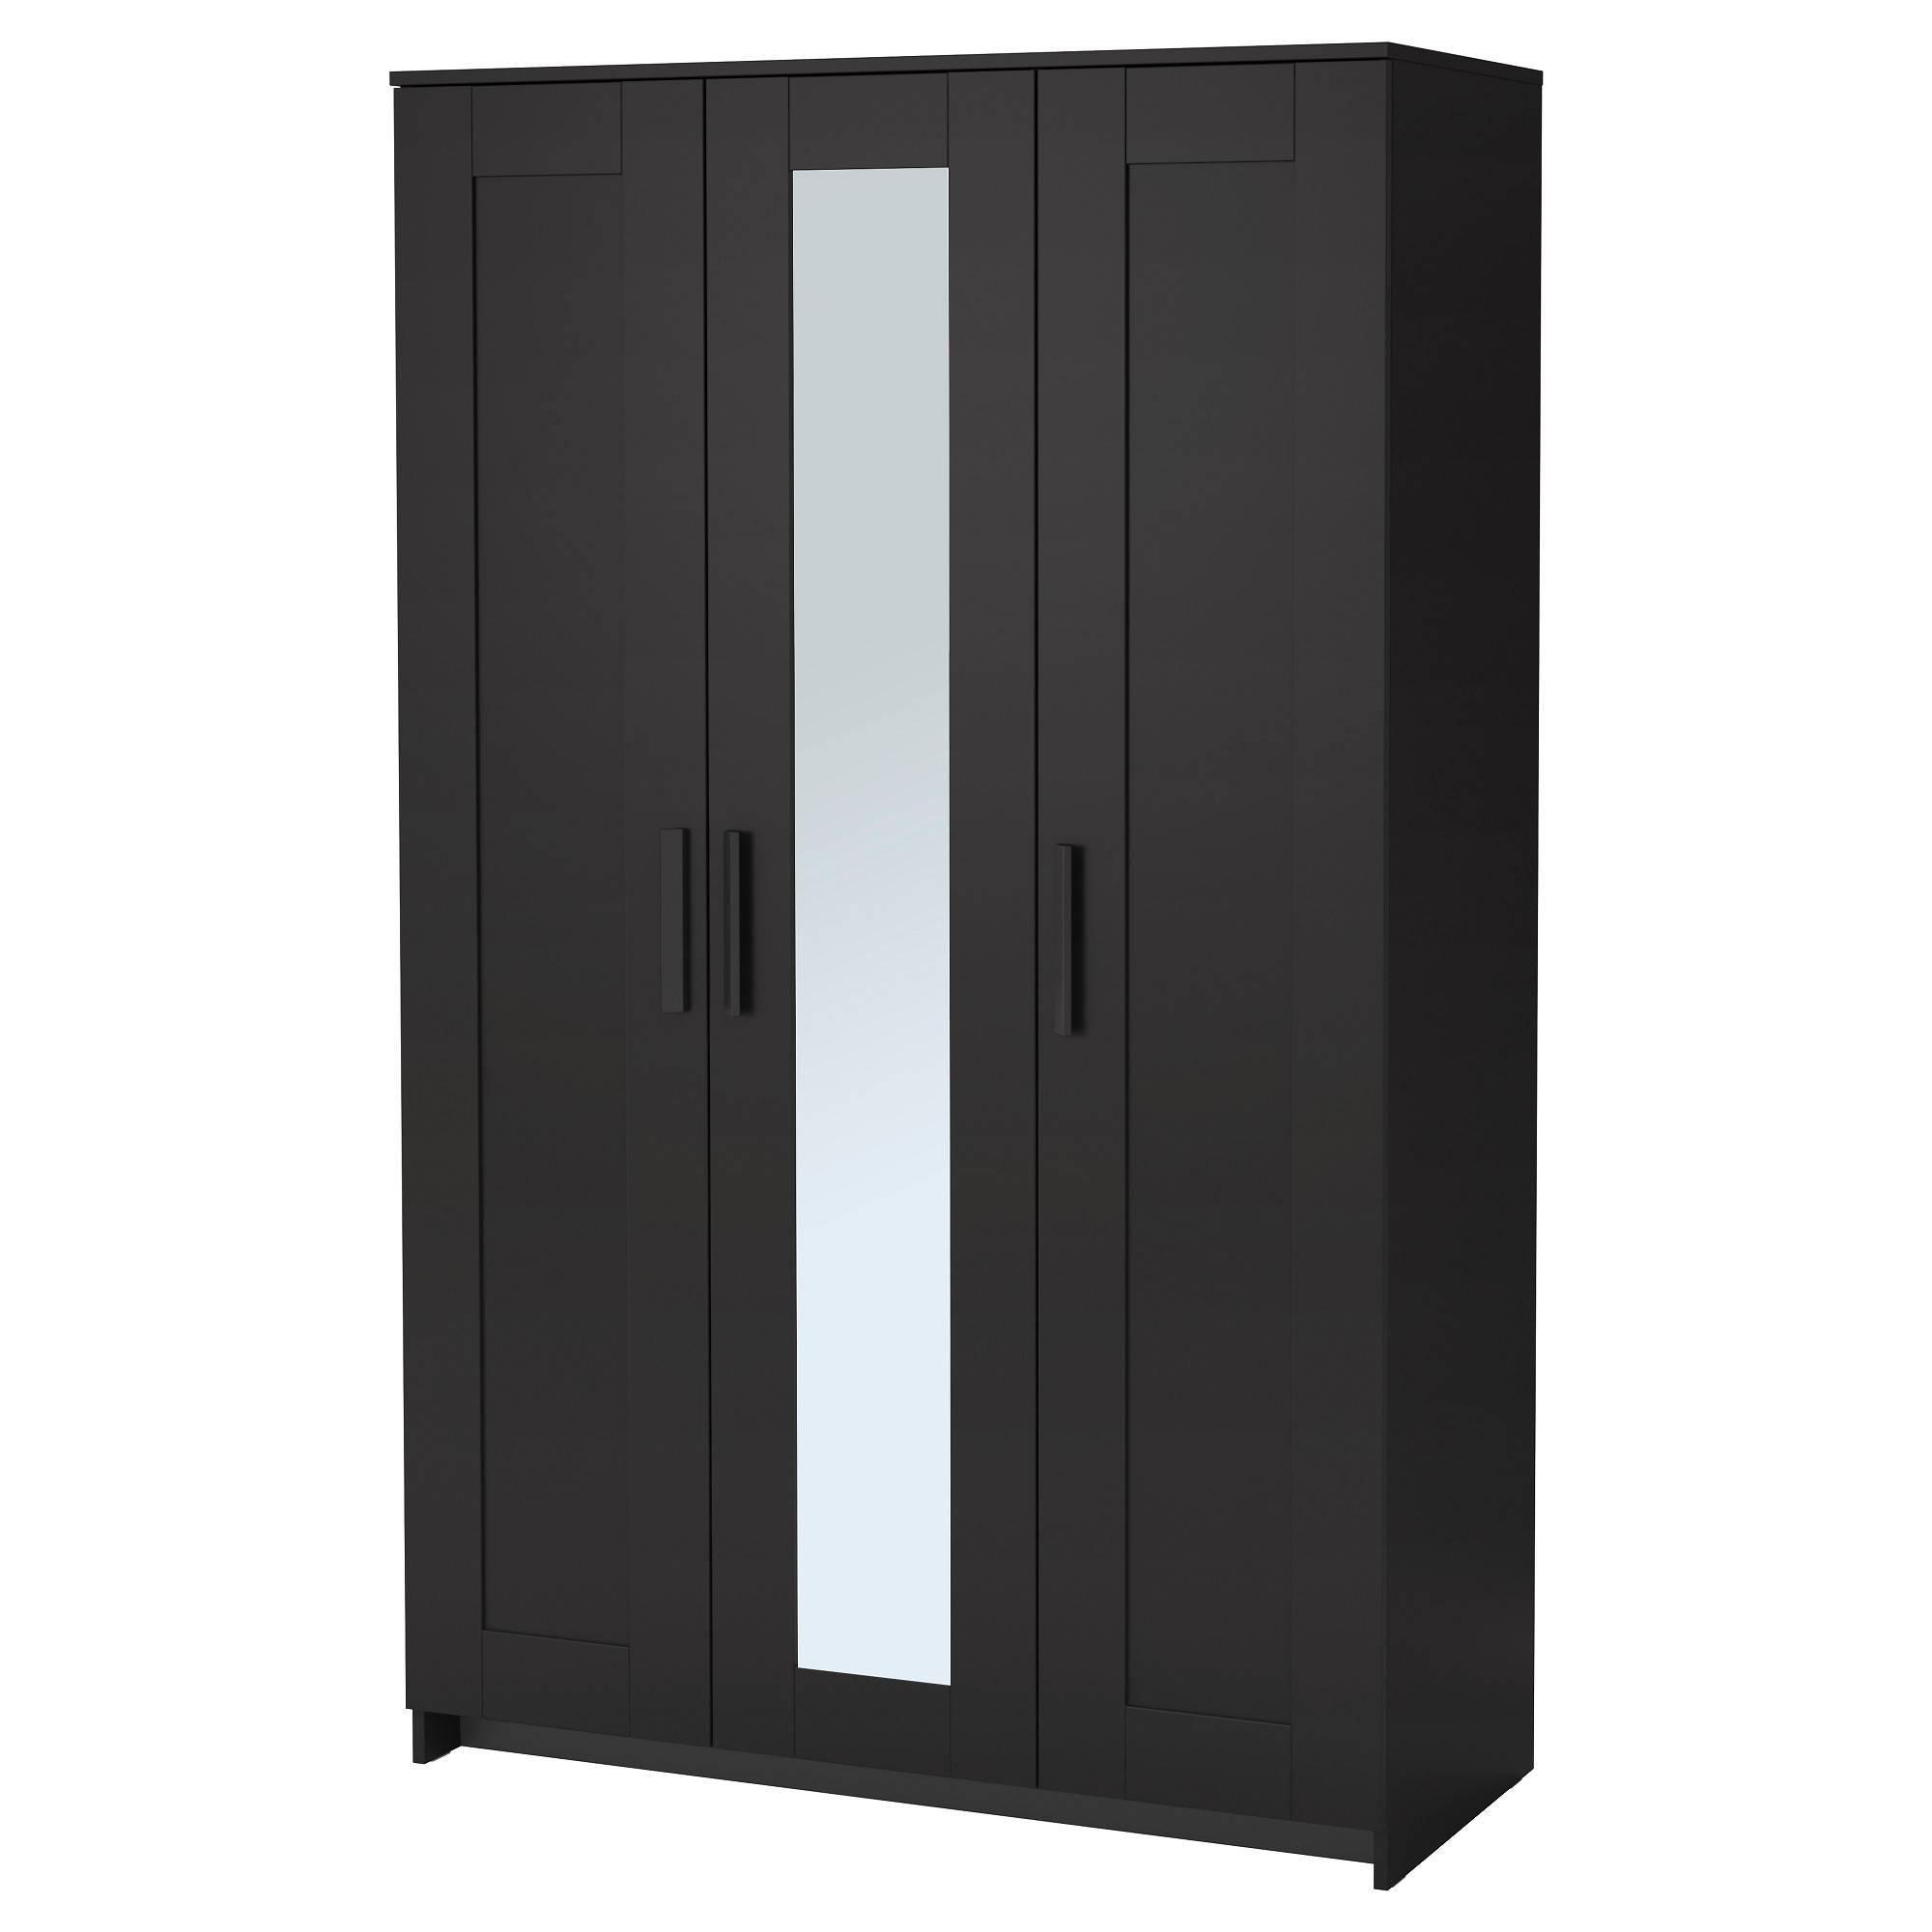 Brimnes Wardrobe With 3 Doors - White - Ikea for Wardrobes 3 Door With Mirror (Image 3 of 15)